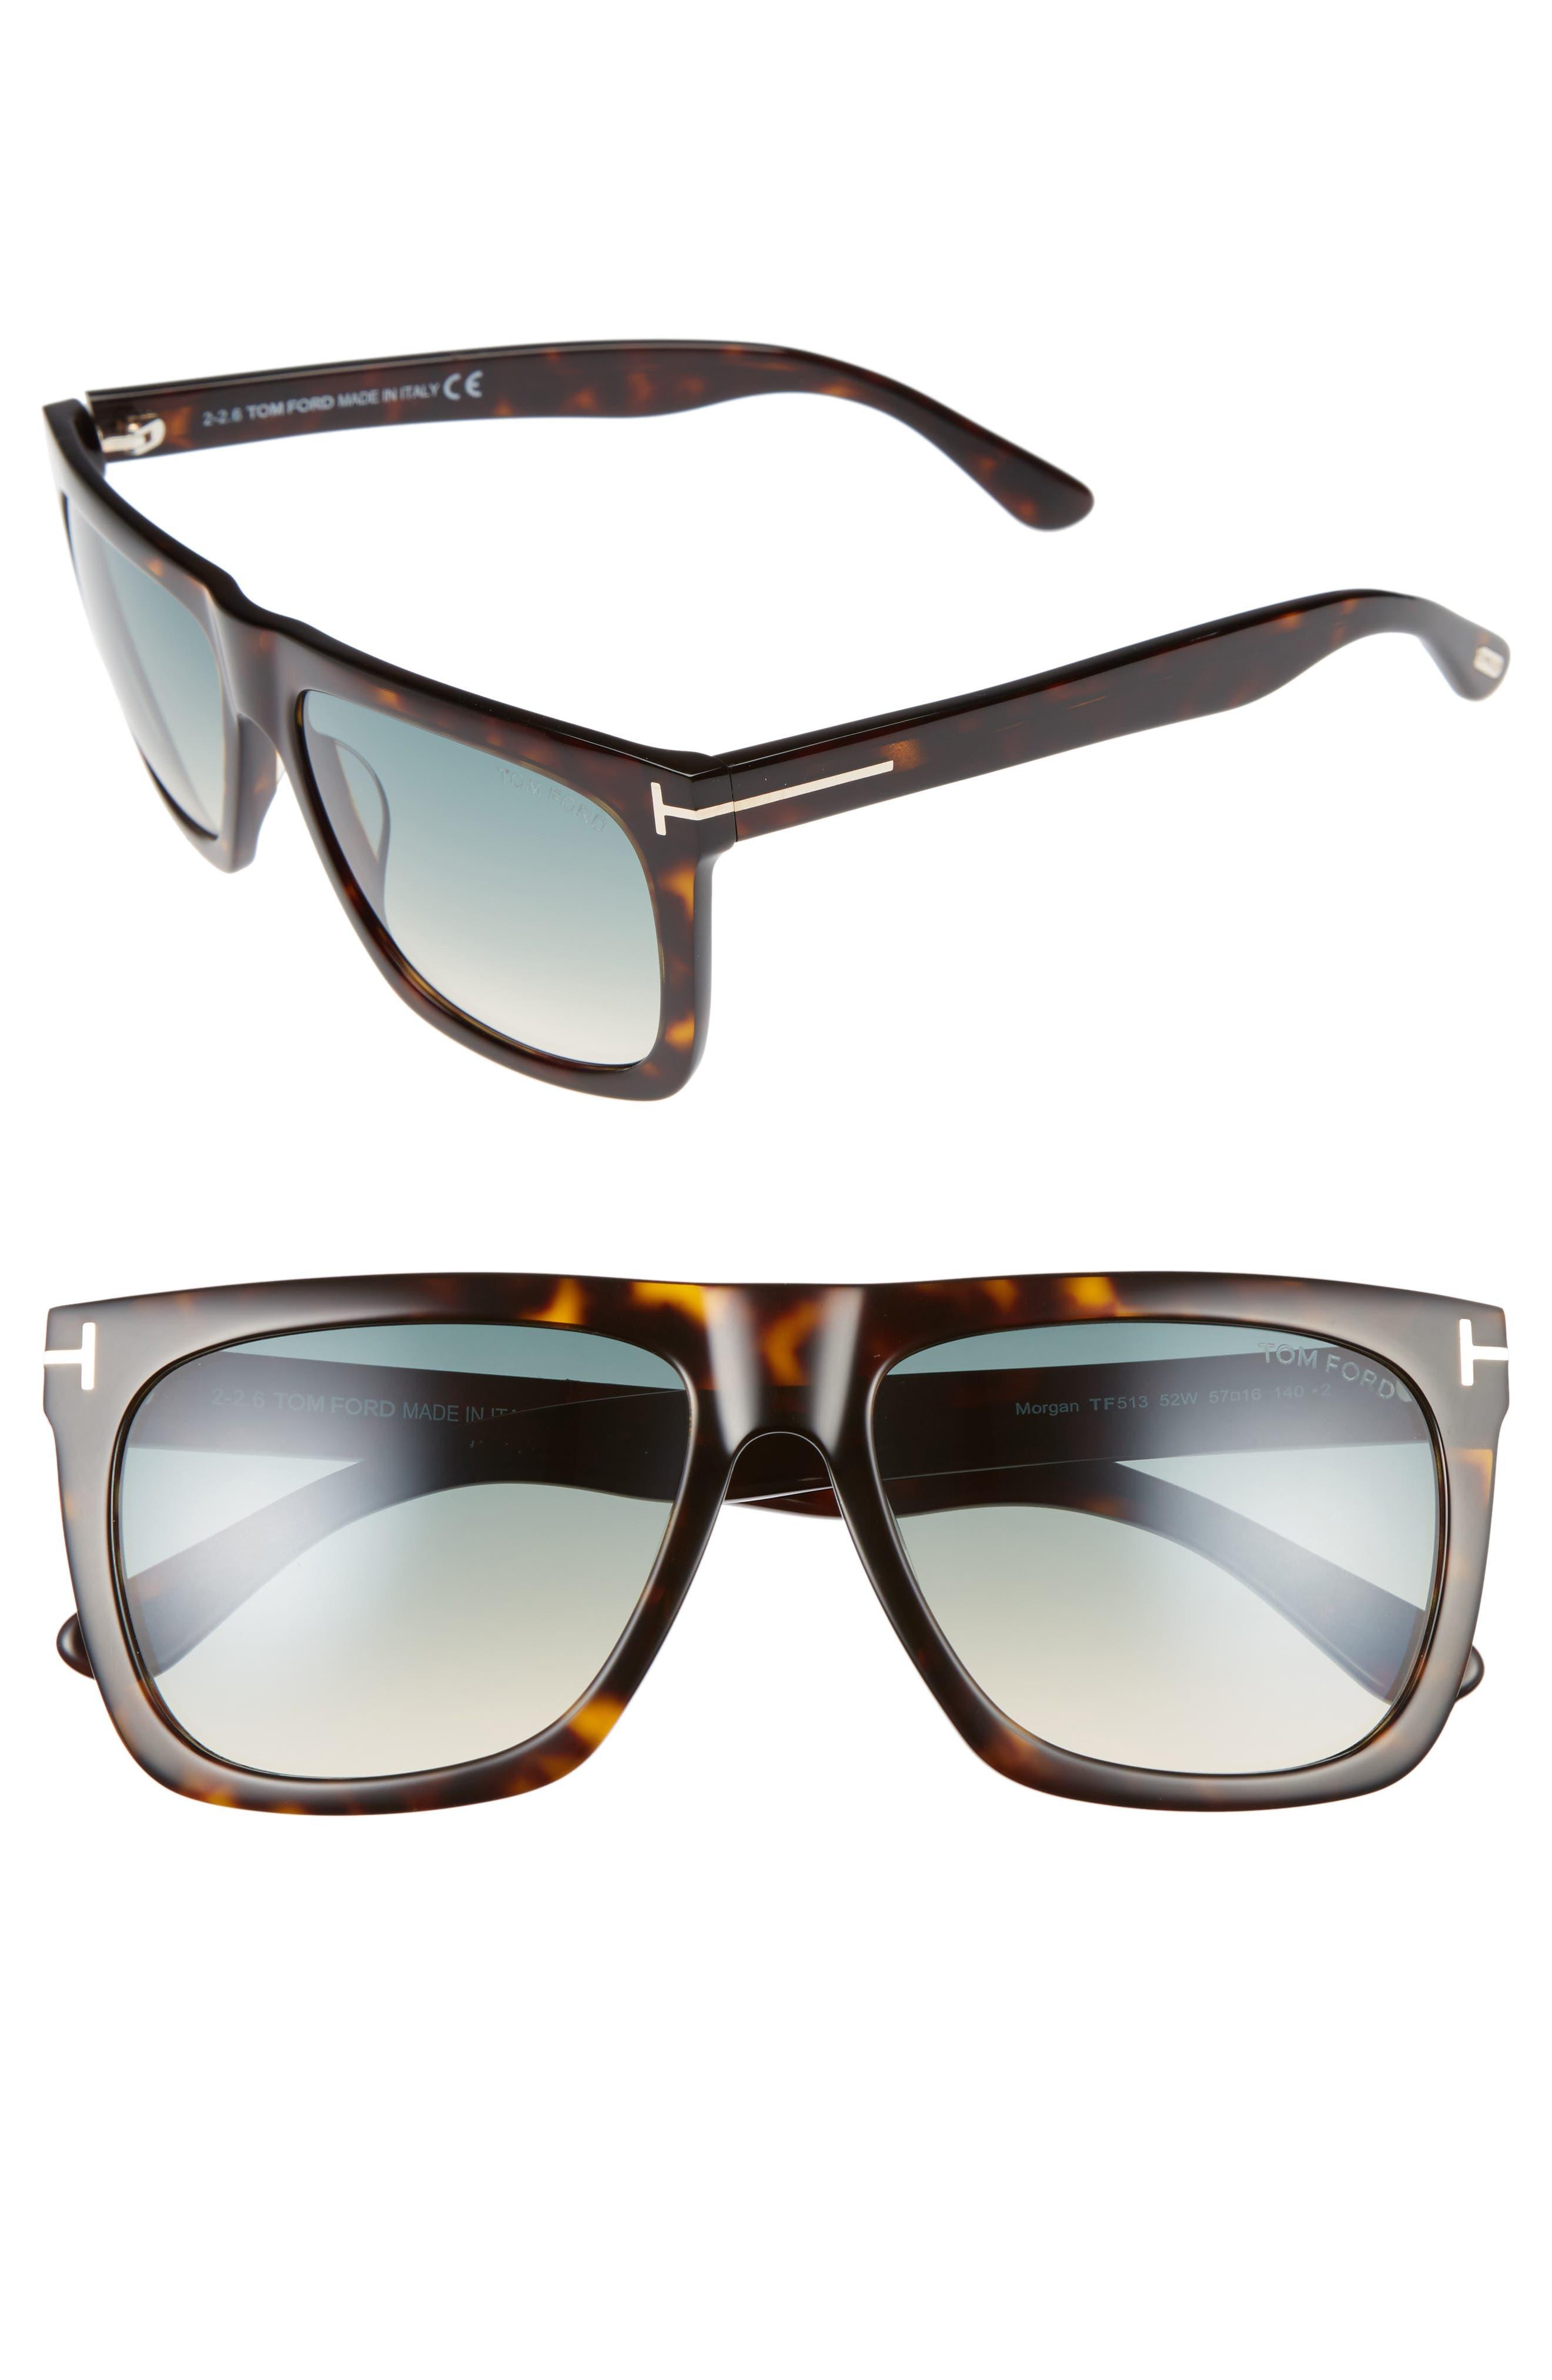 Morgan 57mm Flat Top Sunglasses,                         Main,                         color, Havana/ Turquoise Gradient